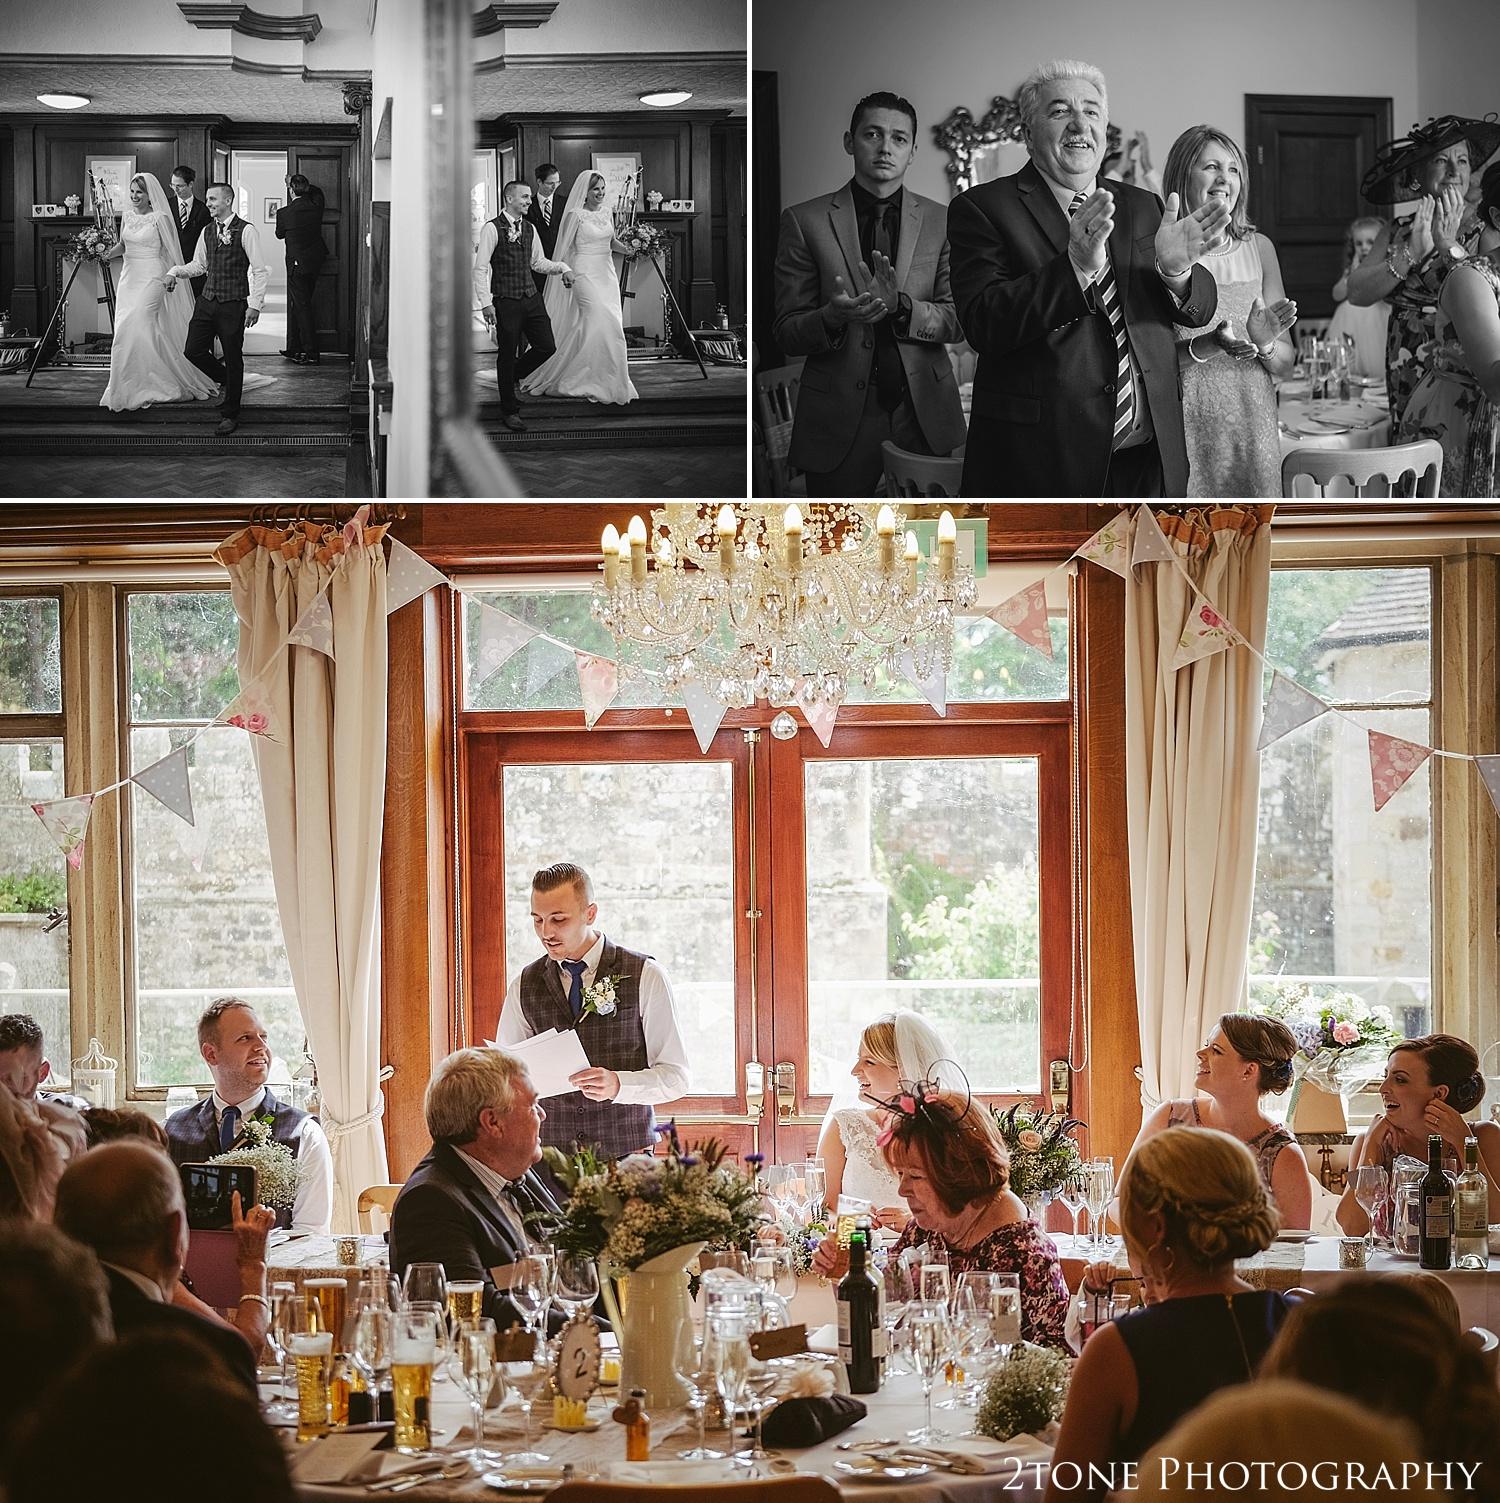 Wedding speeches.  Wedding photography at Guyzance Hall by wedding photographers www.2tonephotography.co.uk